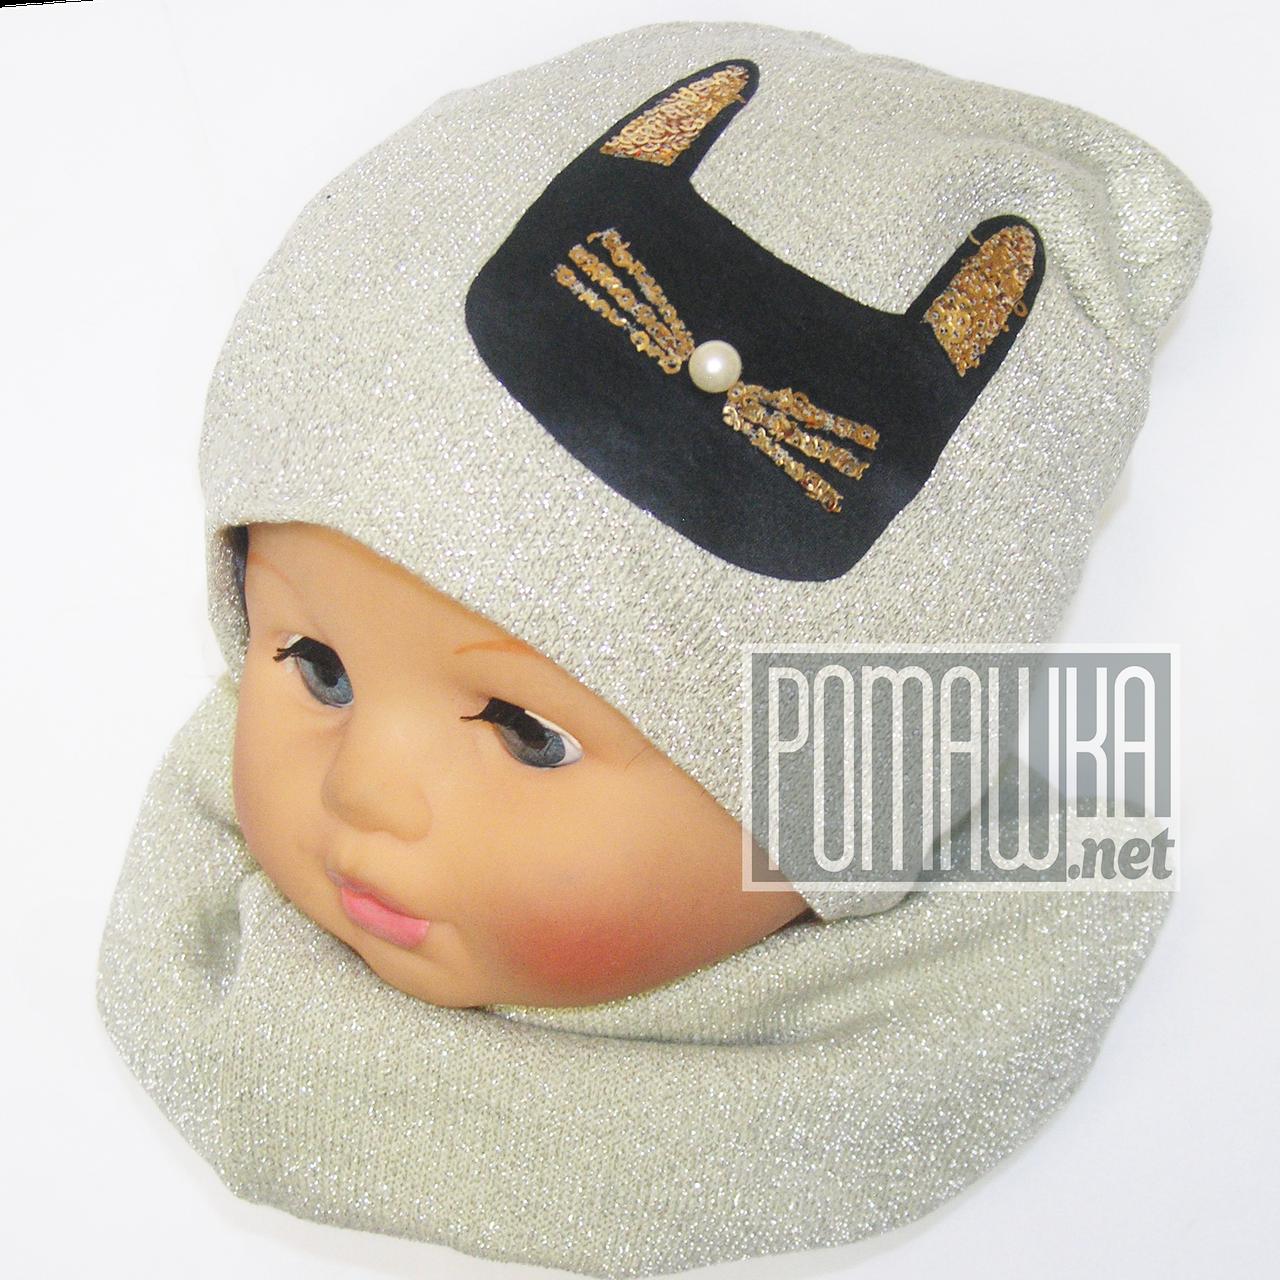 Комплект шапка и снуд (хомут) р. 46-50 для девочки отлично тянется 4361  Бежевый 50 aa6abae73b1ab